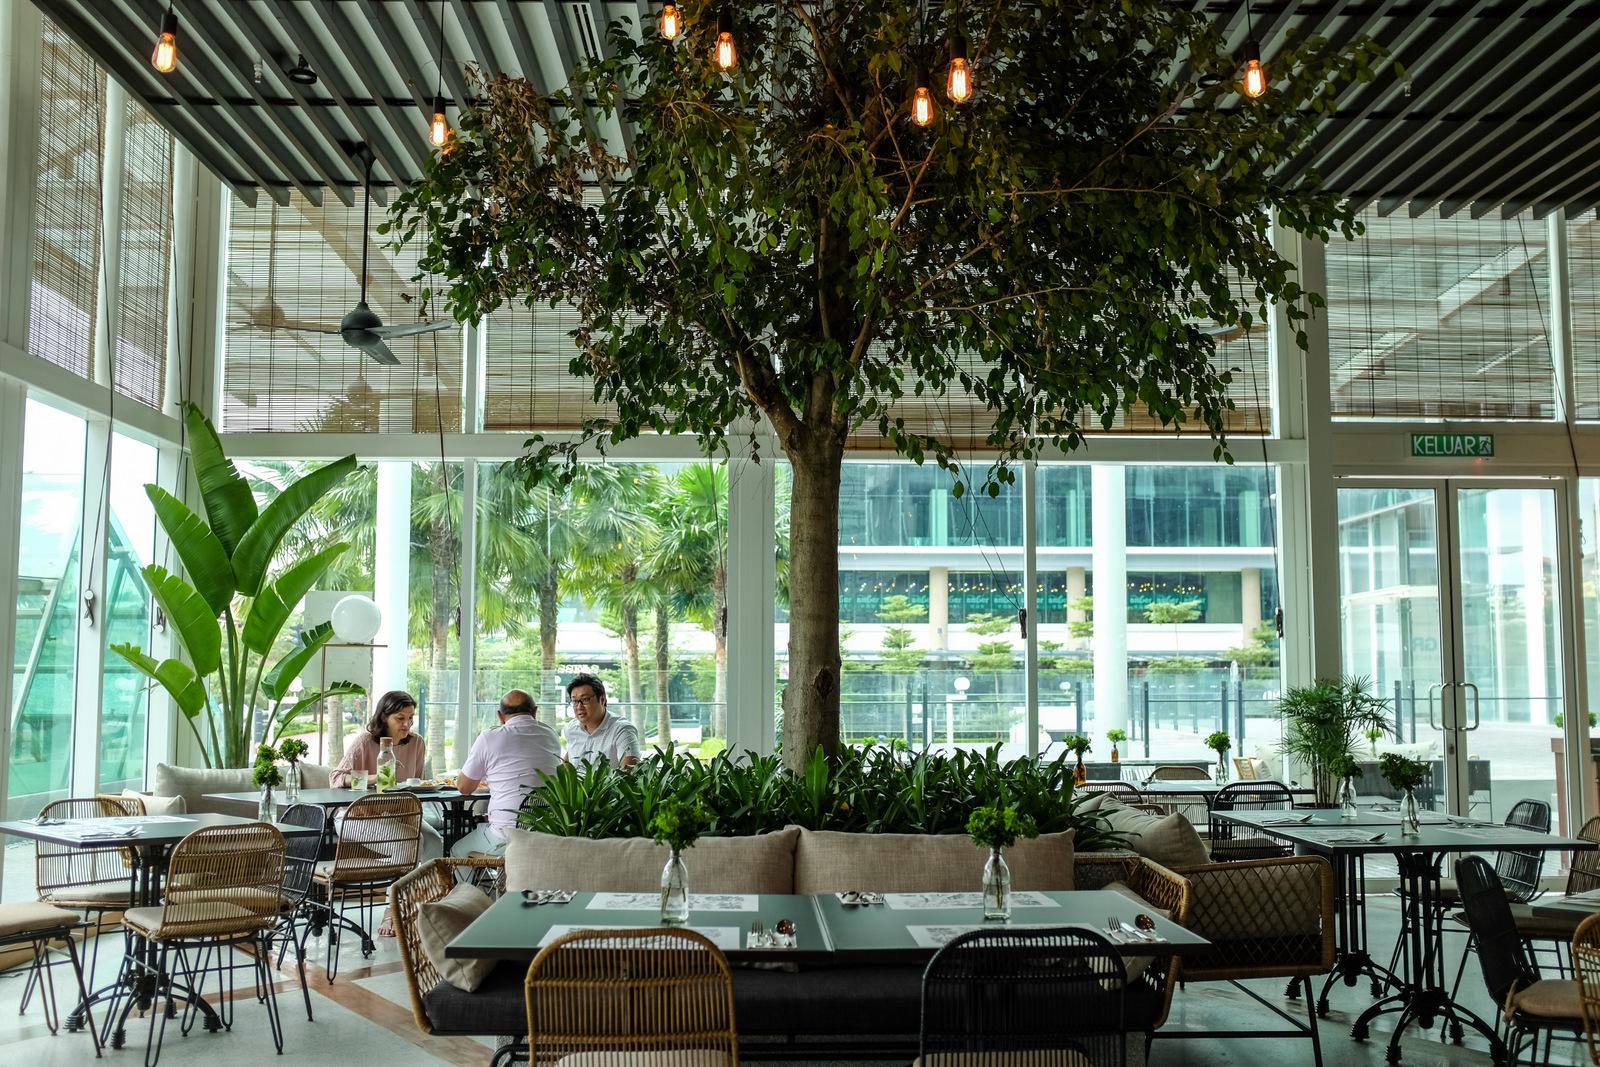 Restaurants Kitchen Design Eat Drink Kl Botanica Co Bangsar South